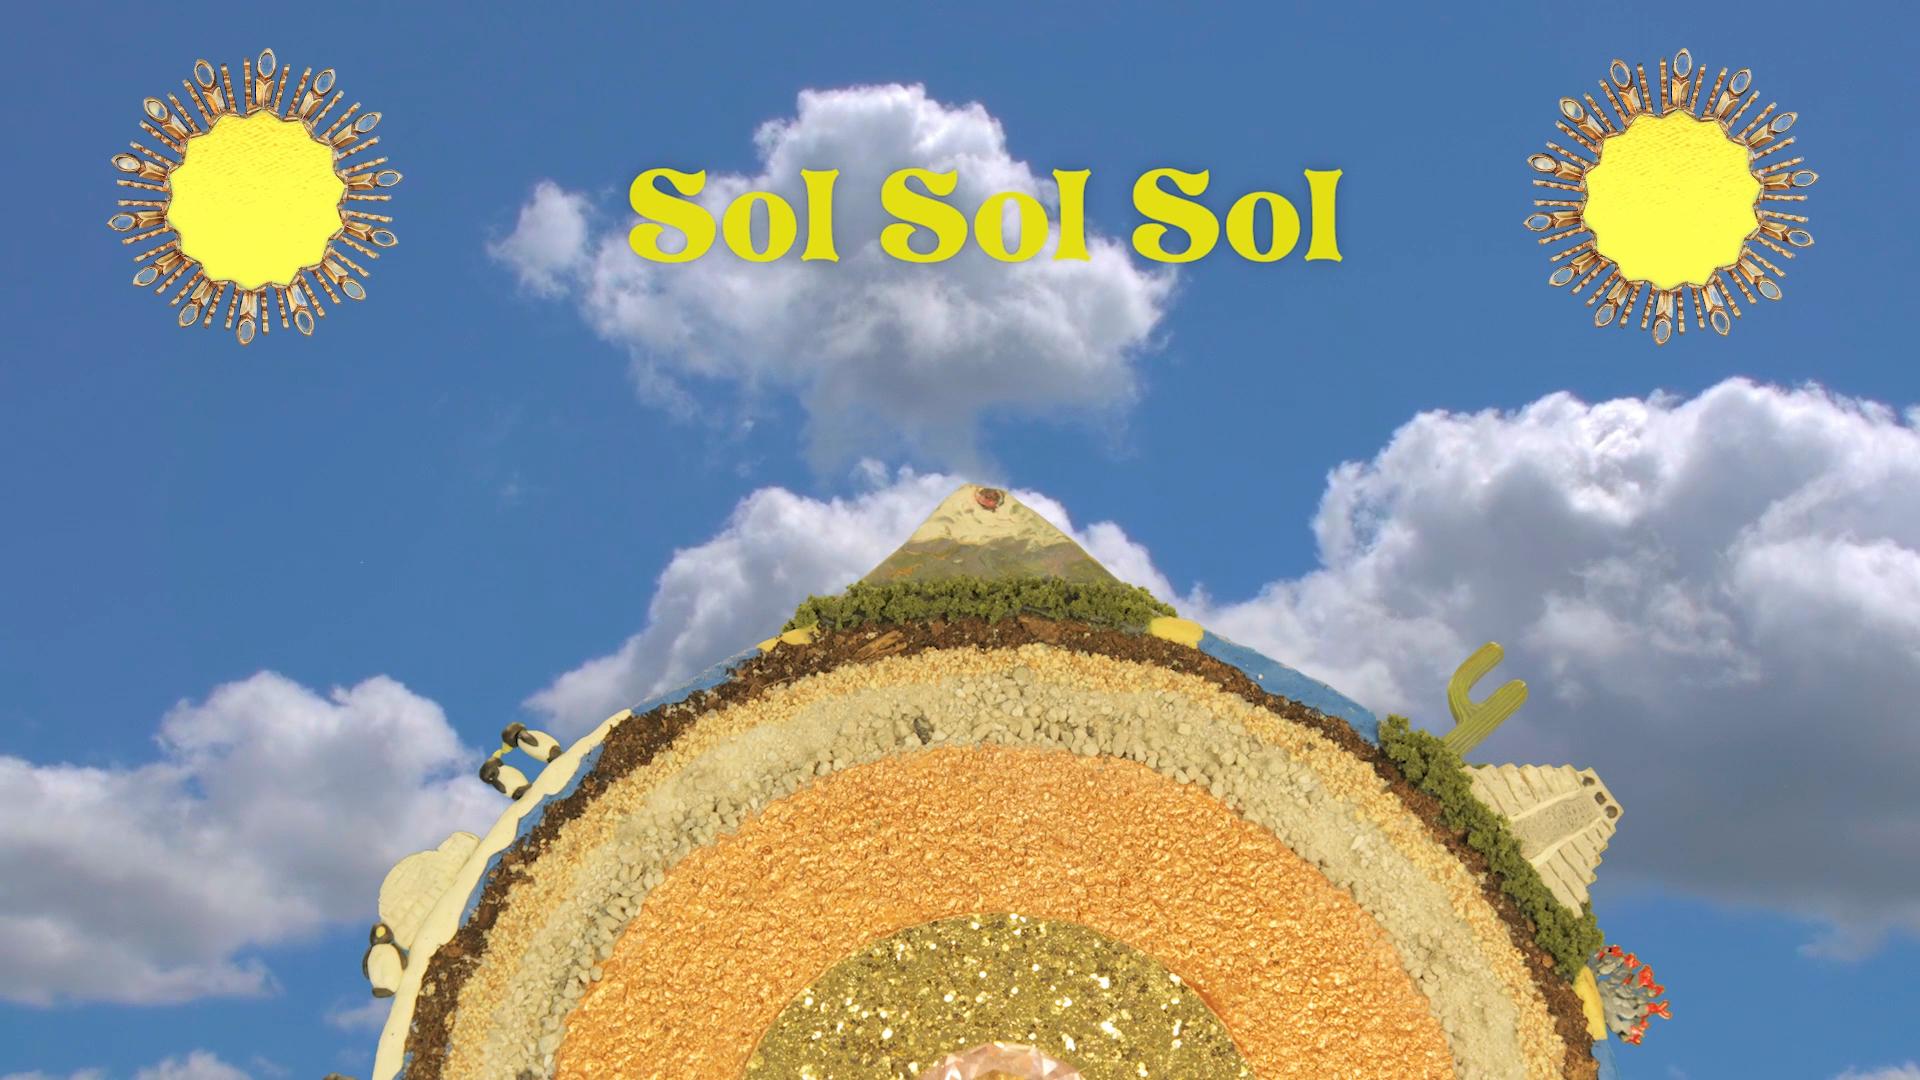 Sol Sol Sol Music Video!